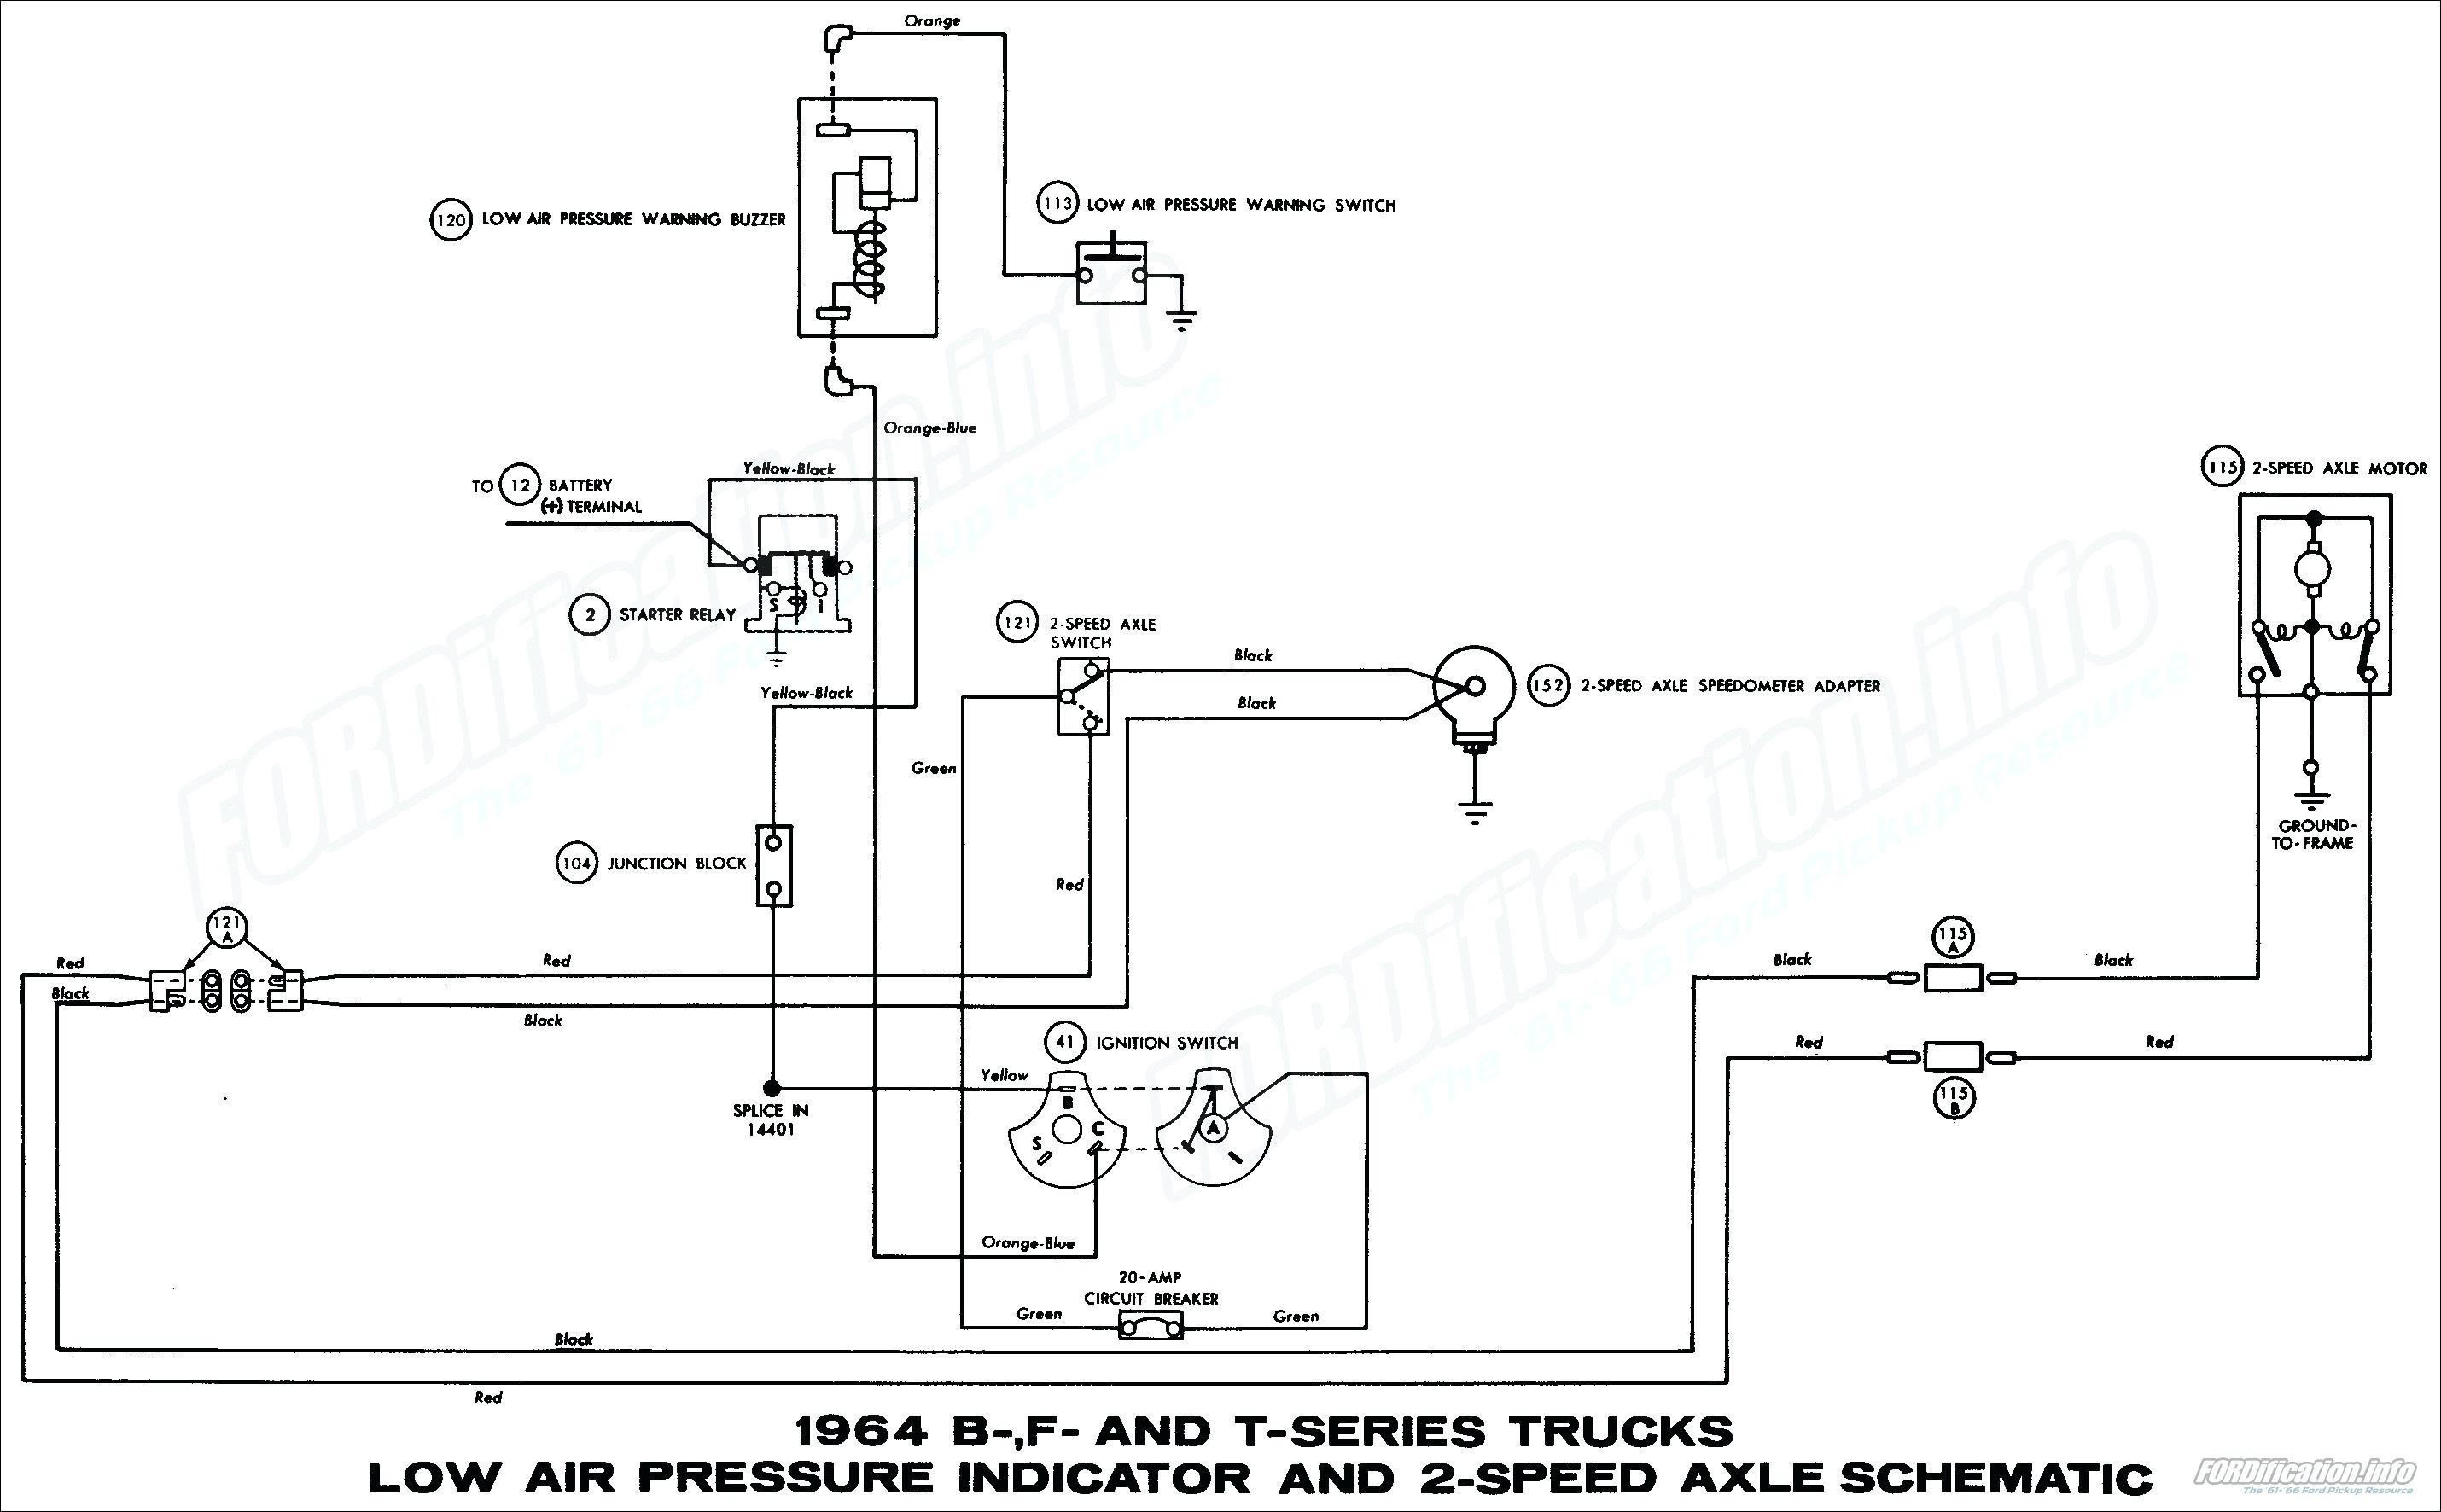 Cutler Hammer Motor Starter Wiring Diagram 2 Cutler Hammer Starter Wiring Diagram Elegant Eaton Motor Starter Of Cutler Hammer Motor Starter Wiring Diagram 2